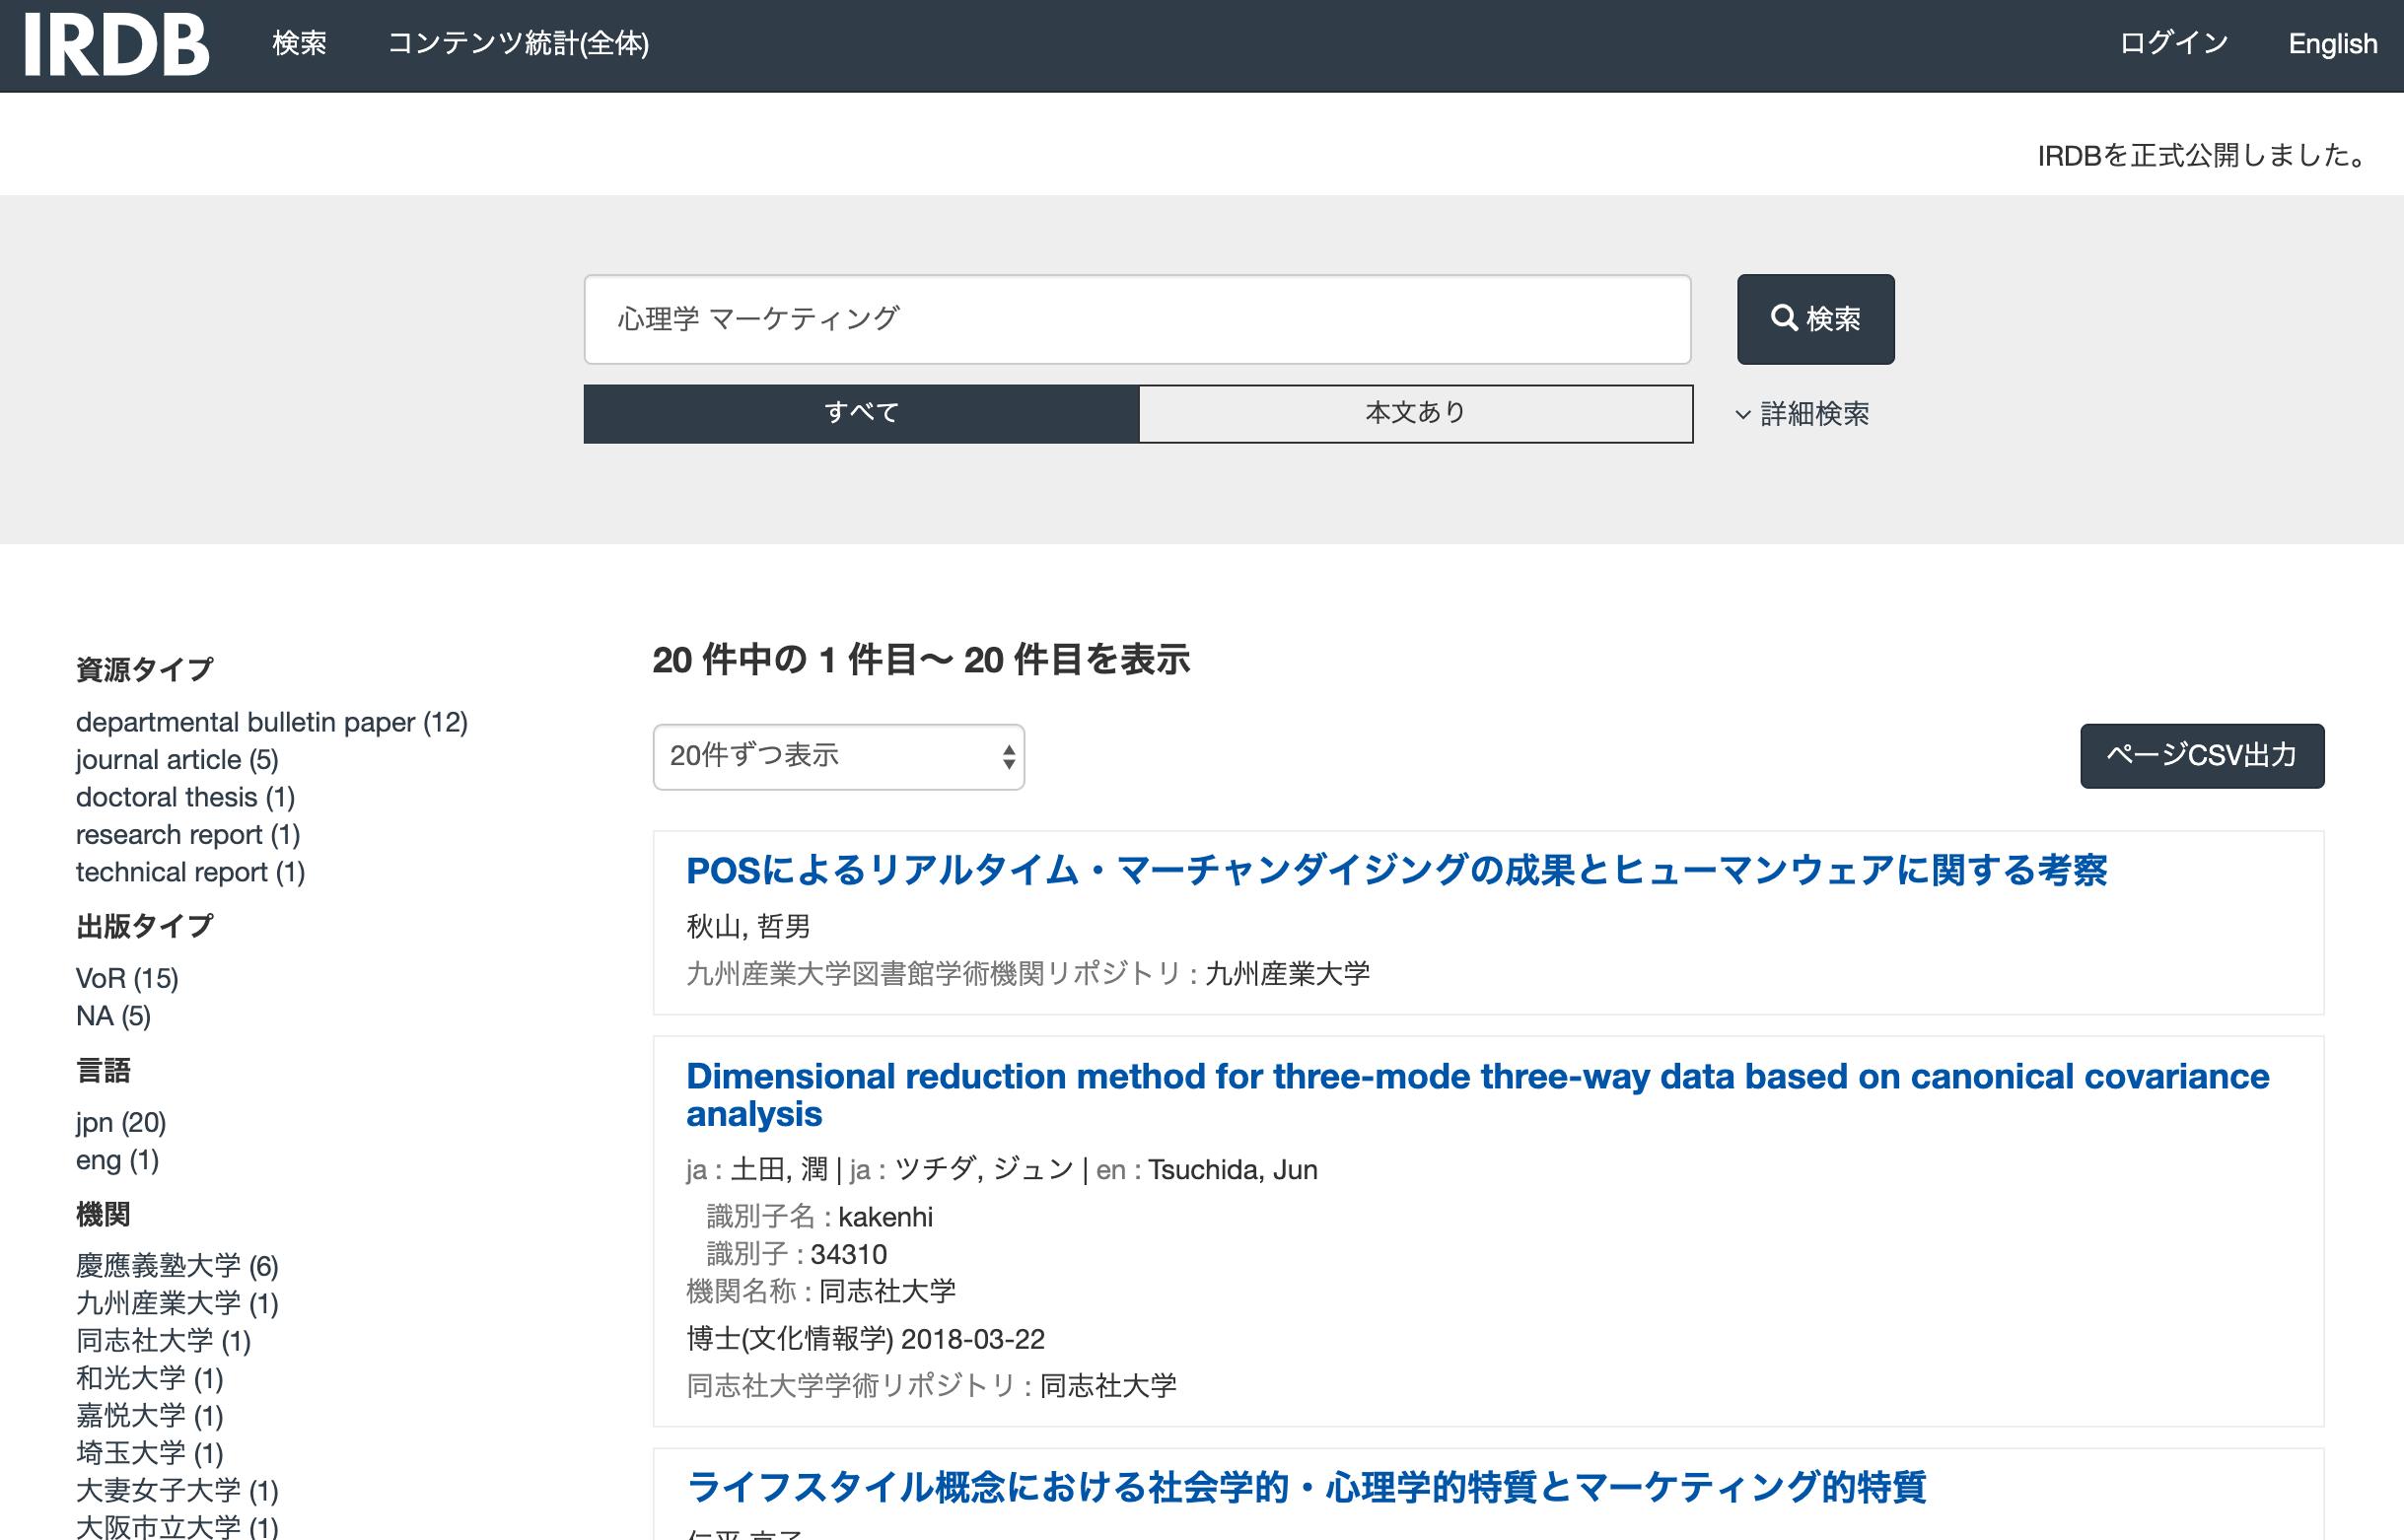 IRDB(学術機関リポジトリデータベース)の検索結果